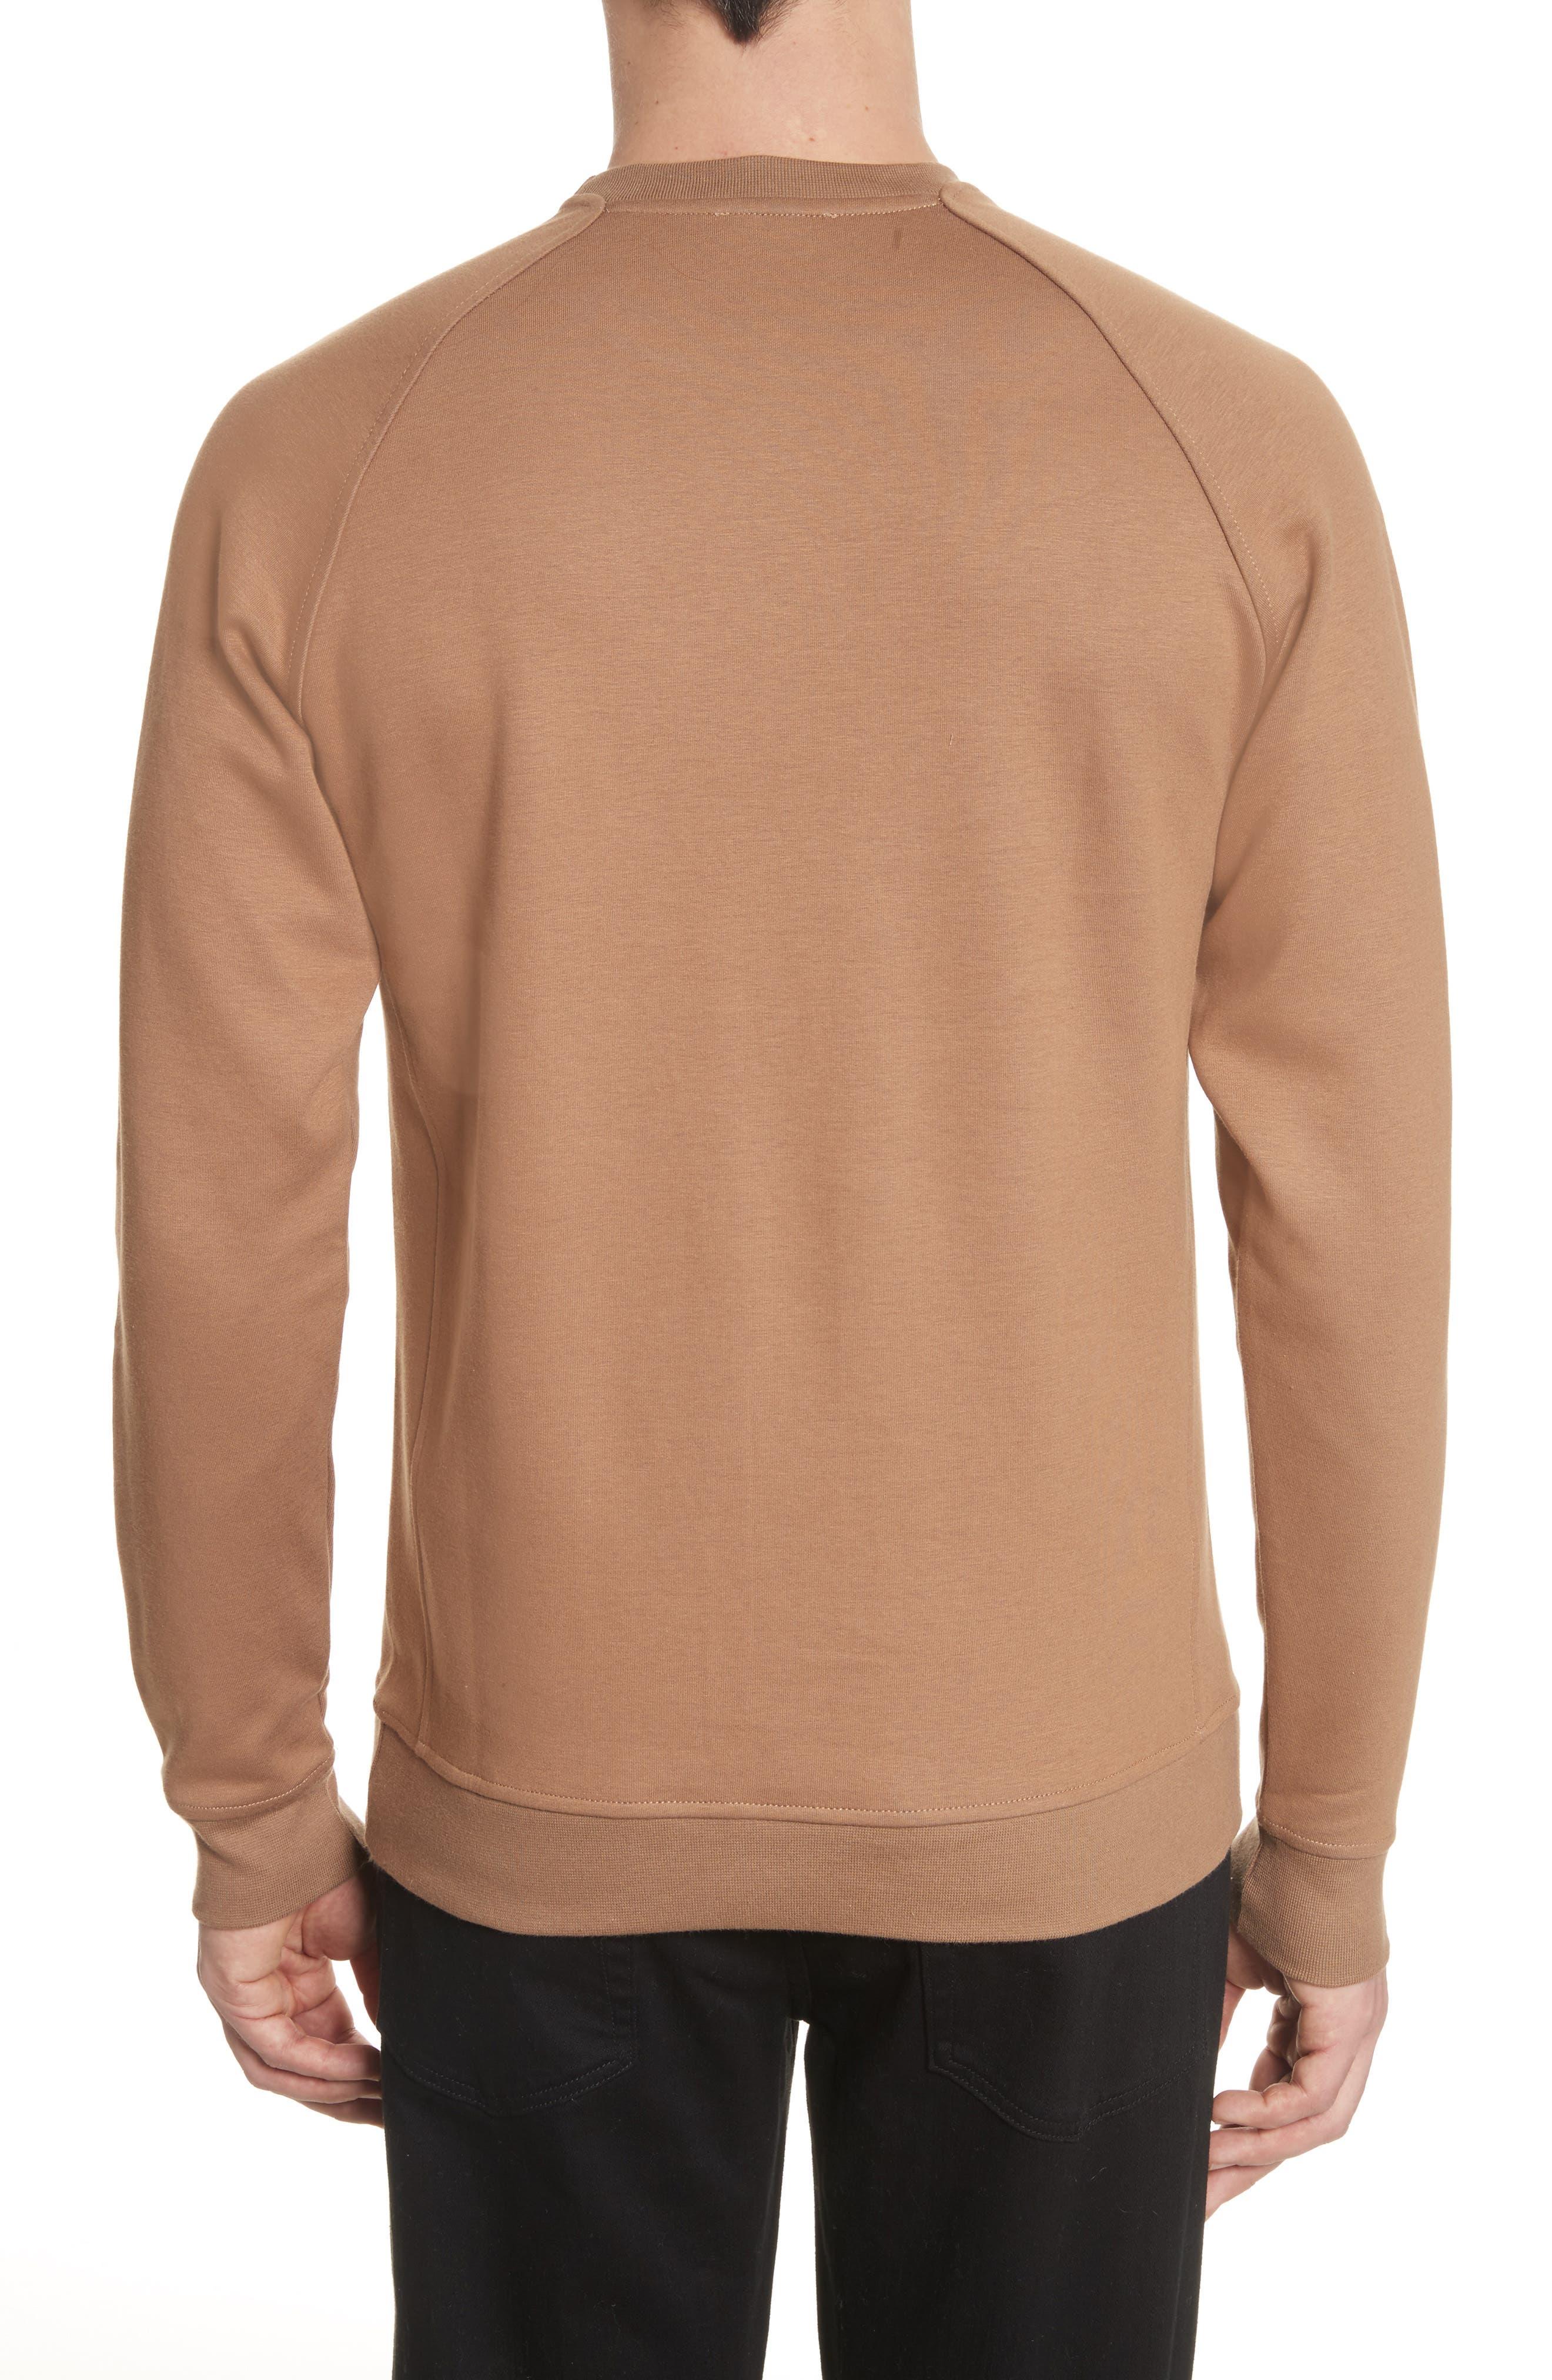 Ketel Dry Mercerized Crewneck Sweatshirt,                             Alternate thumbnail 2, color,                             Light Sand